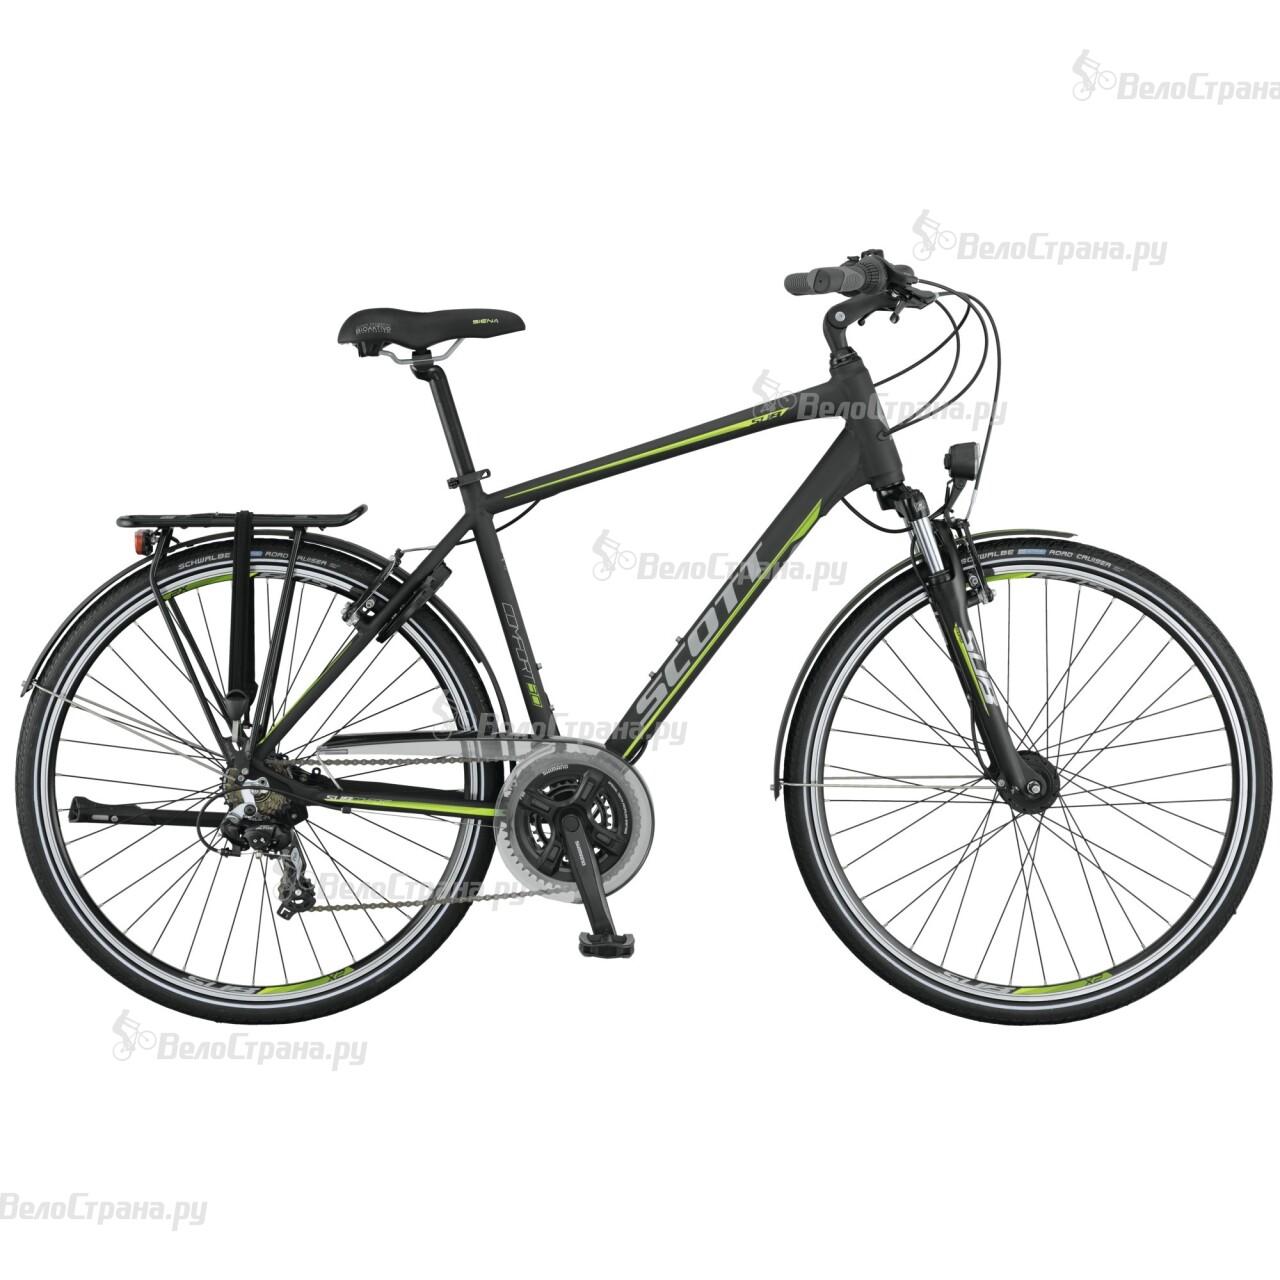 Велосипед Scott Sub Comfort 30 (2015)